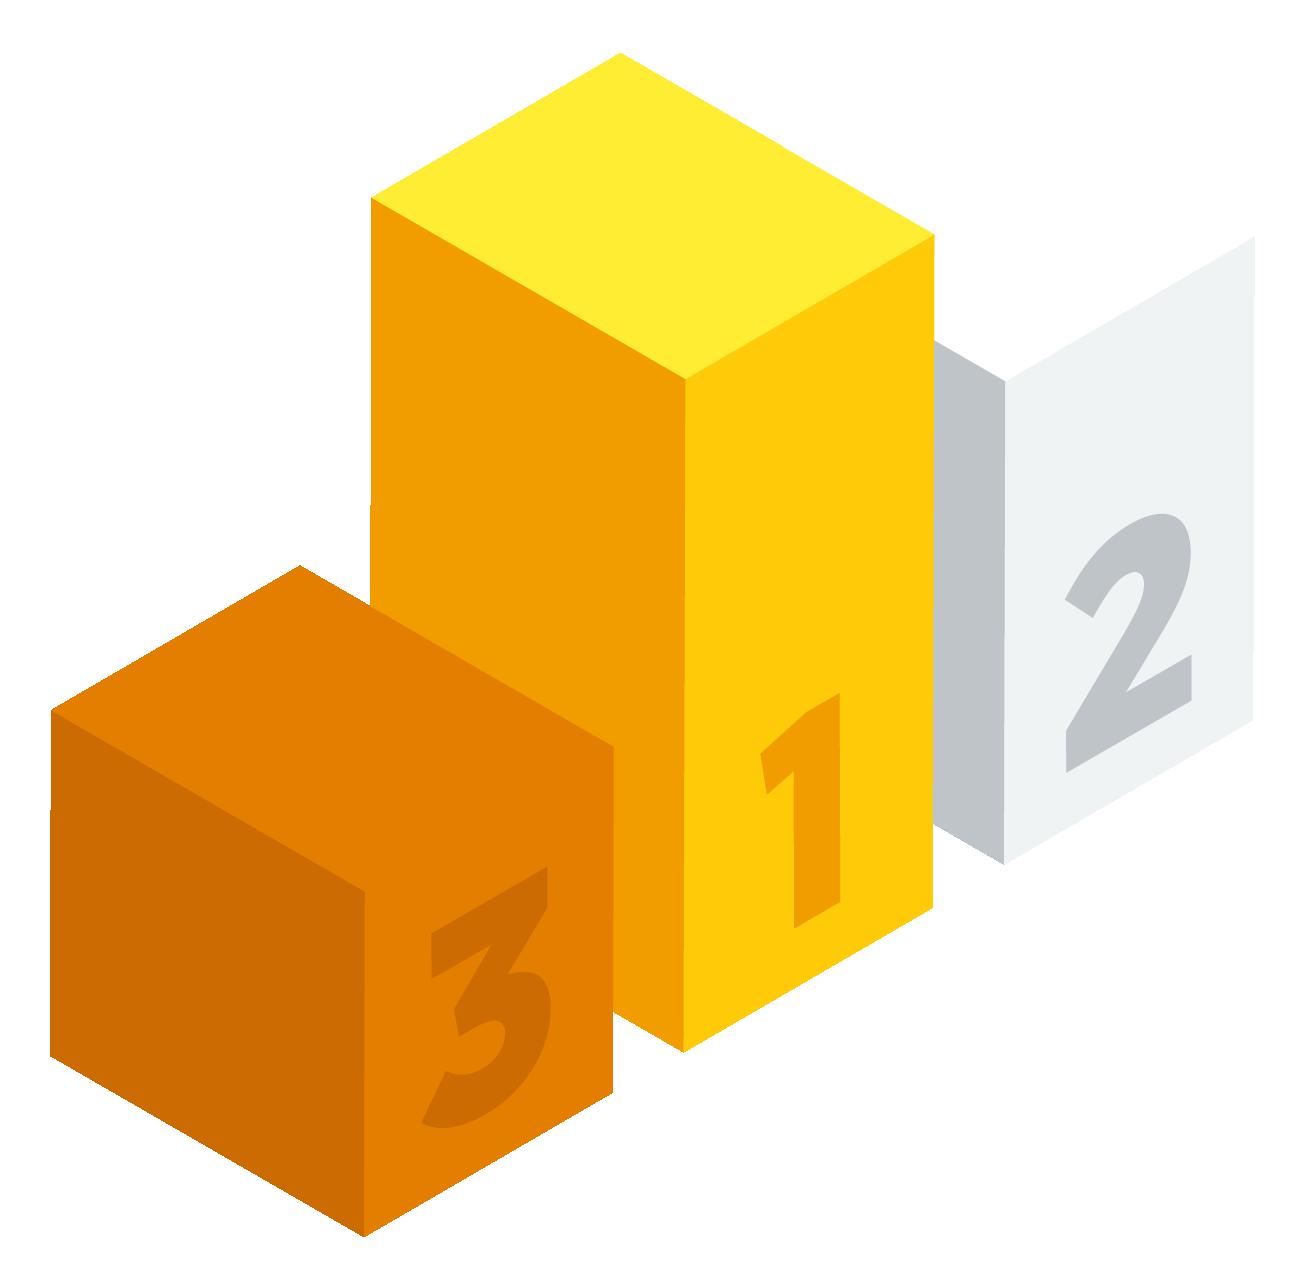 icon-rank-19